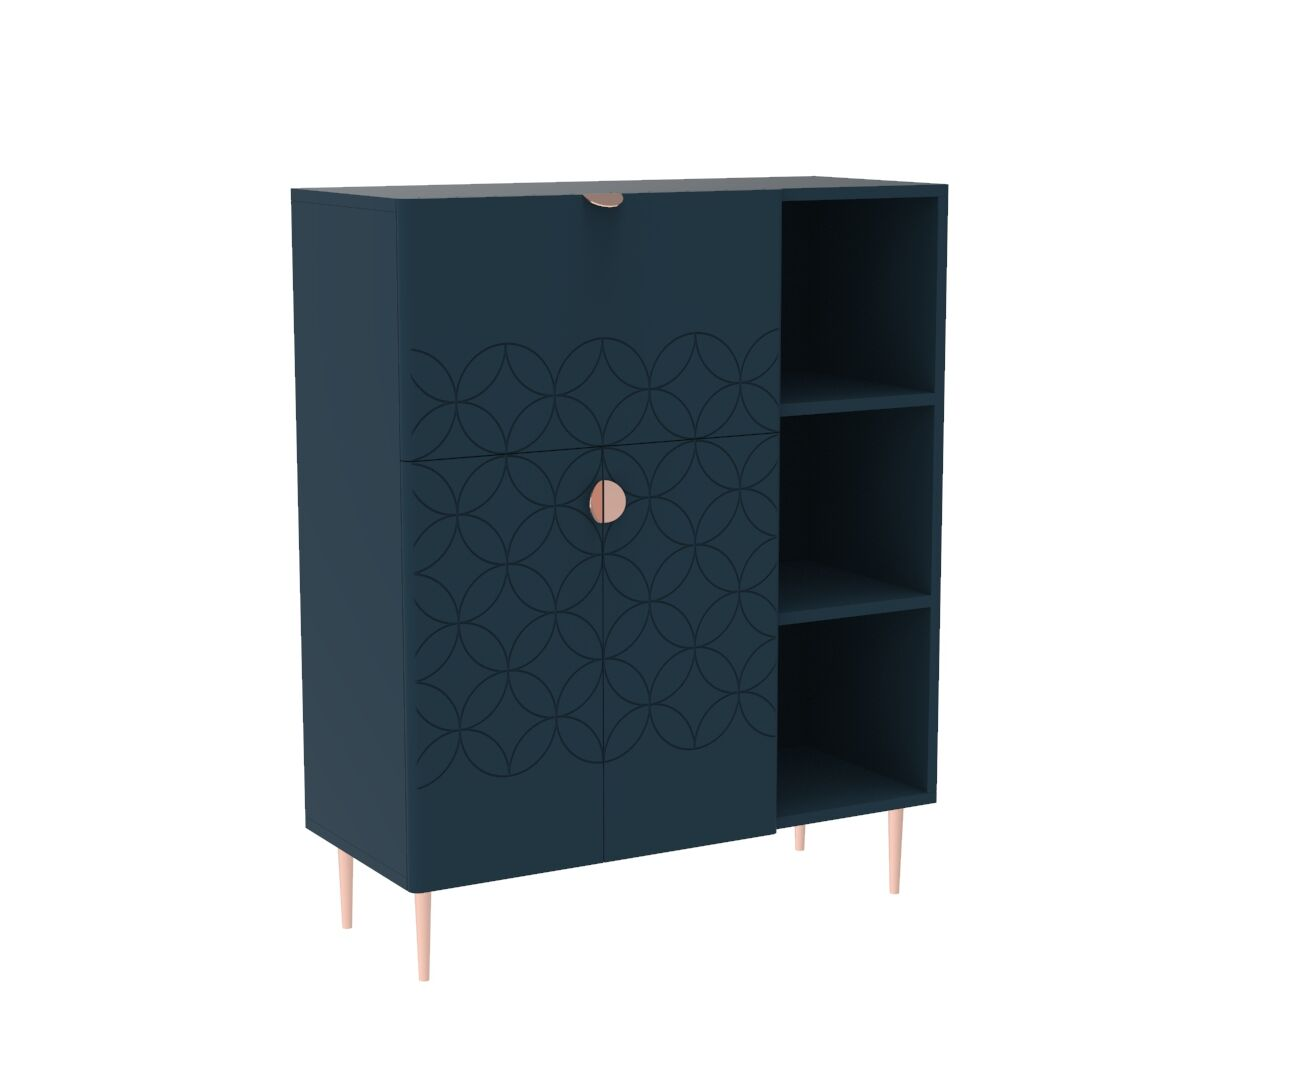 Mid Century Modern Ami Compact Bureau in Regal Blue and Copper